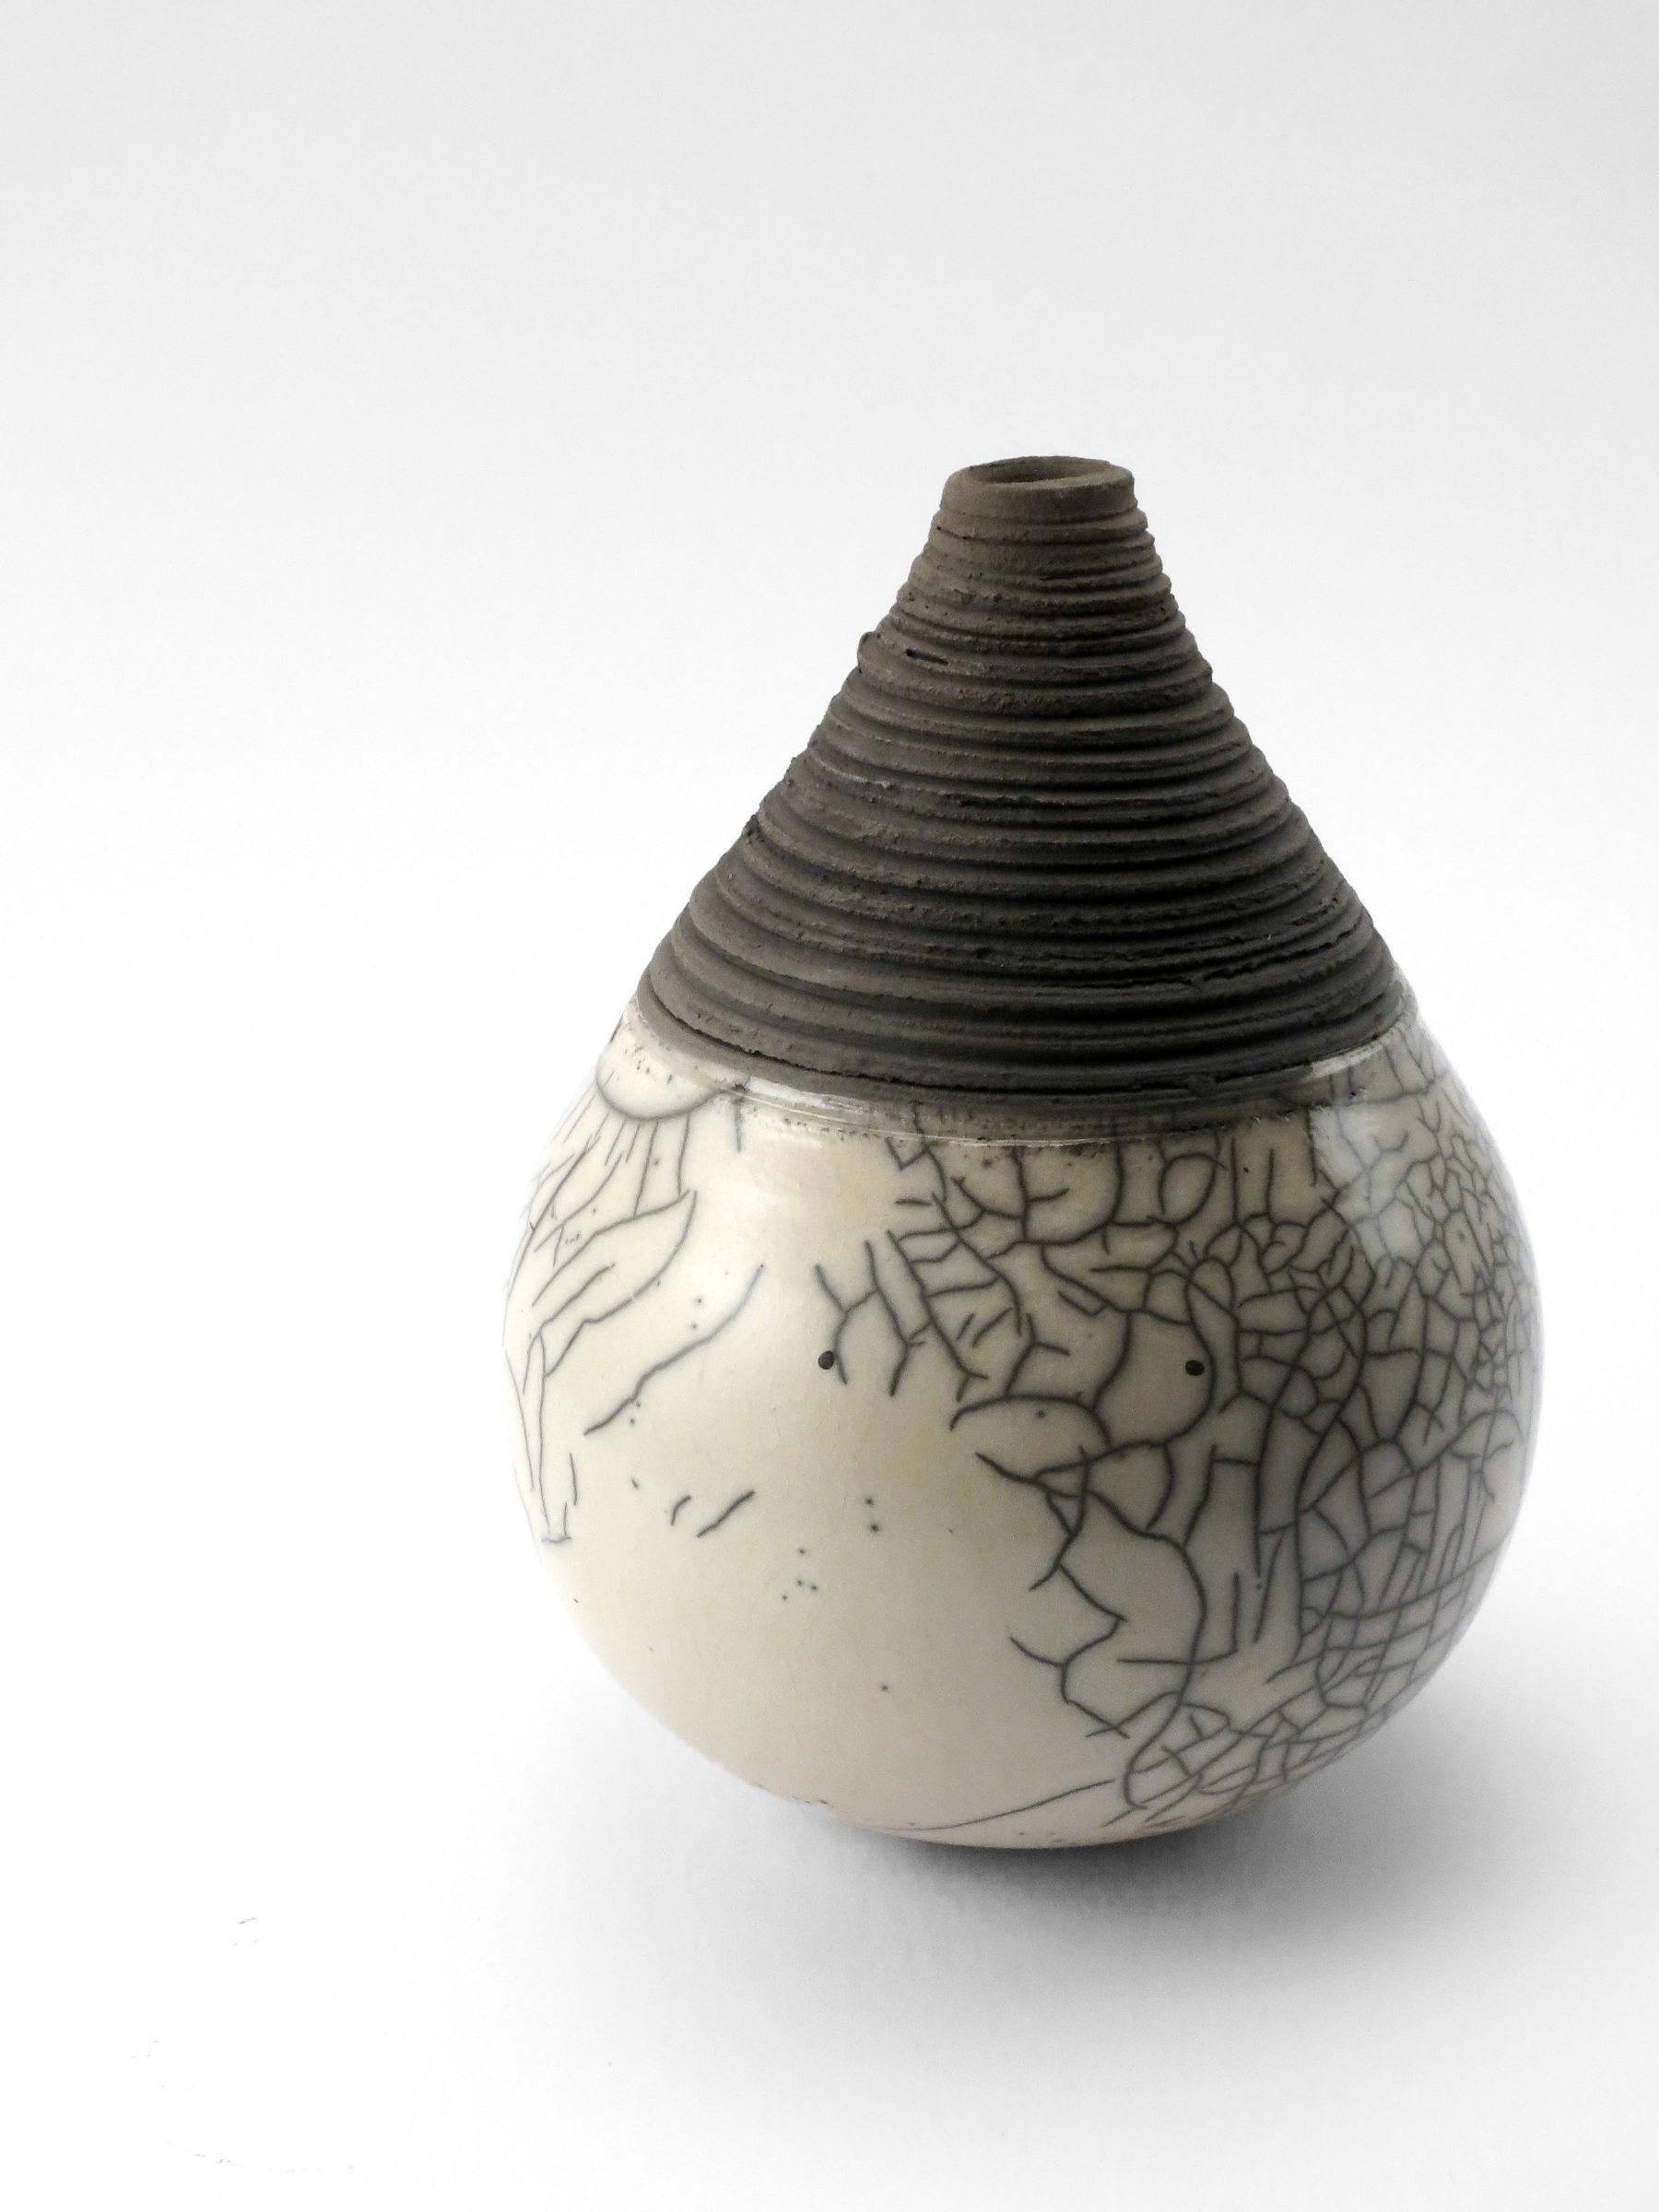 Fractured but Whole II: Whispering Globe - Ildikó Károlyi